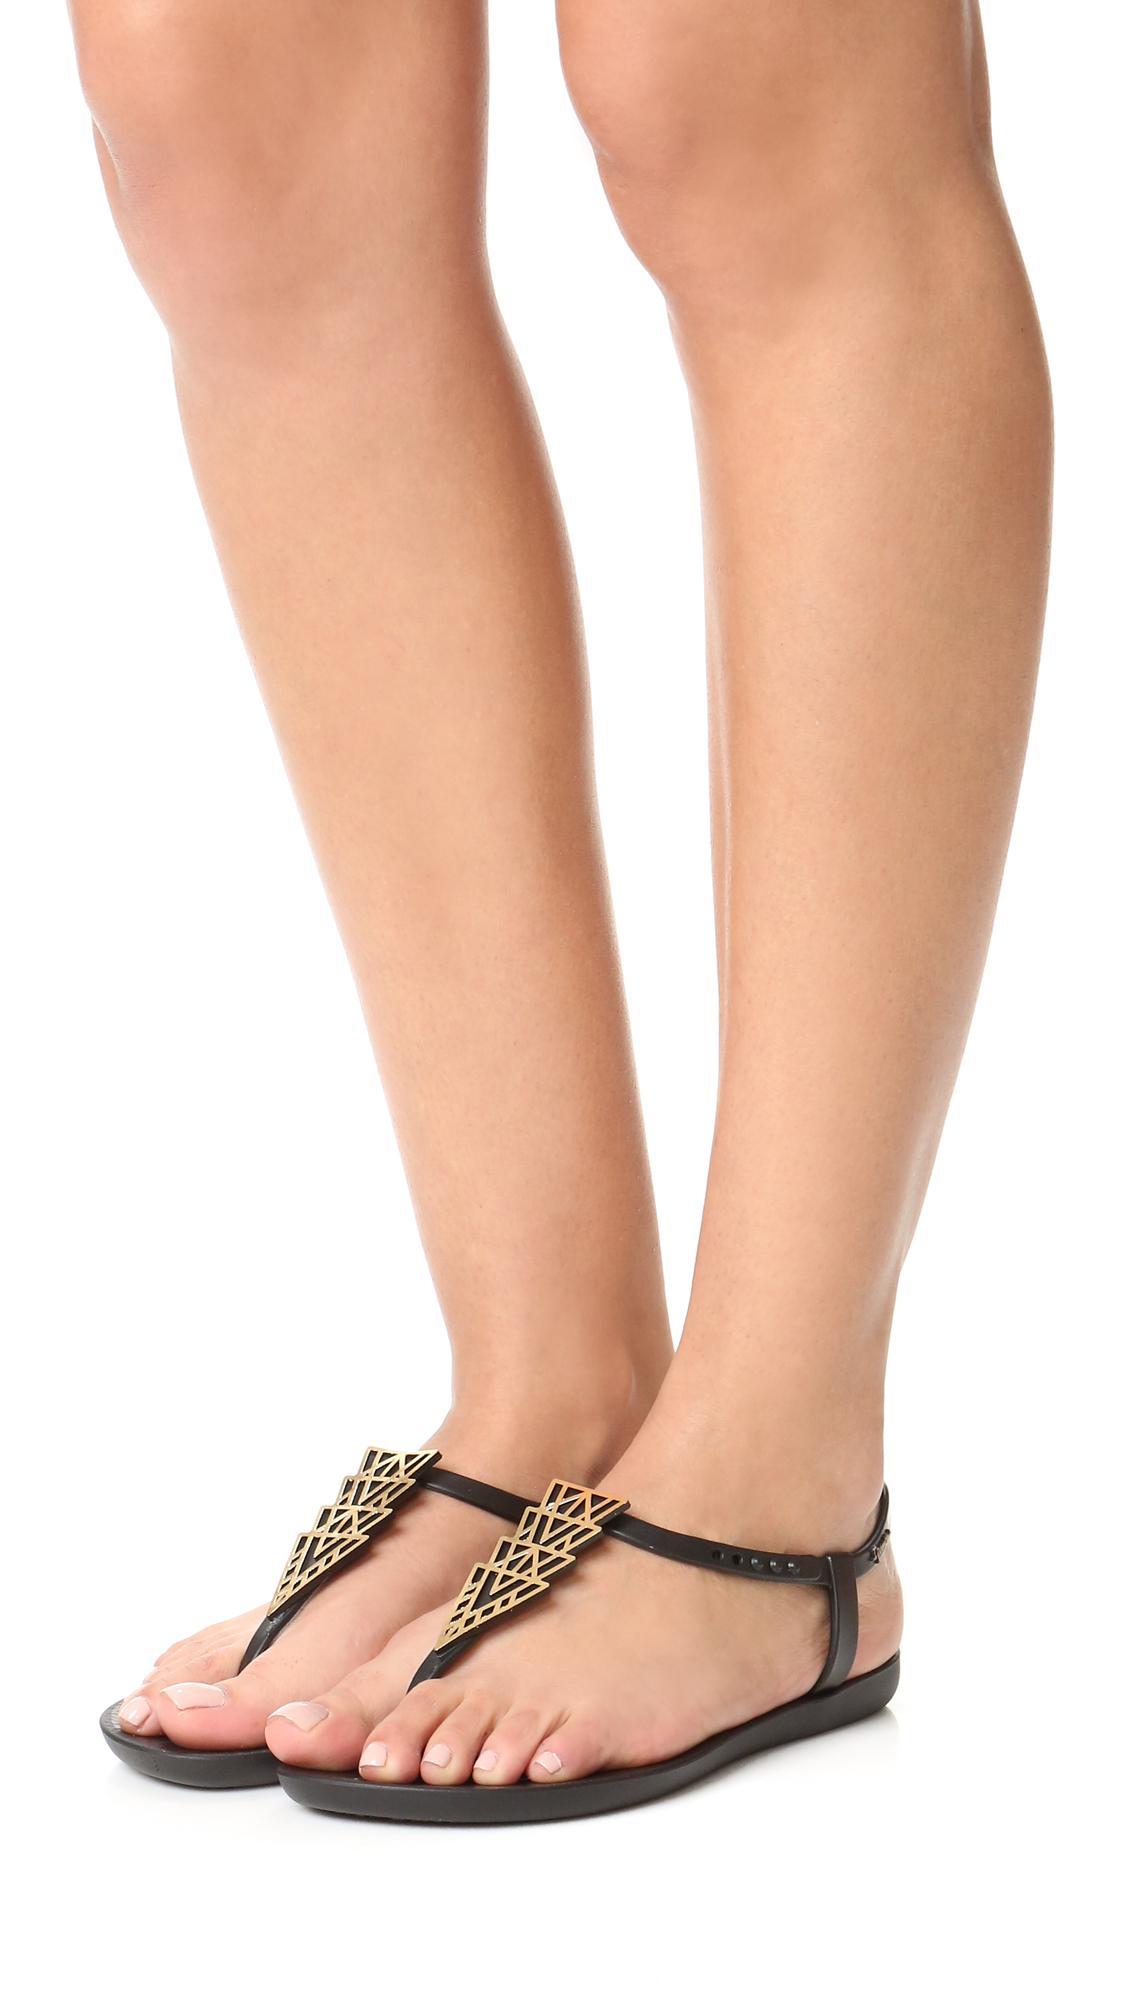 d70bedd543d3a Ipanema Deco Sandals in Black - Lyst